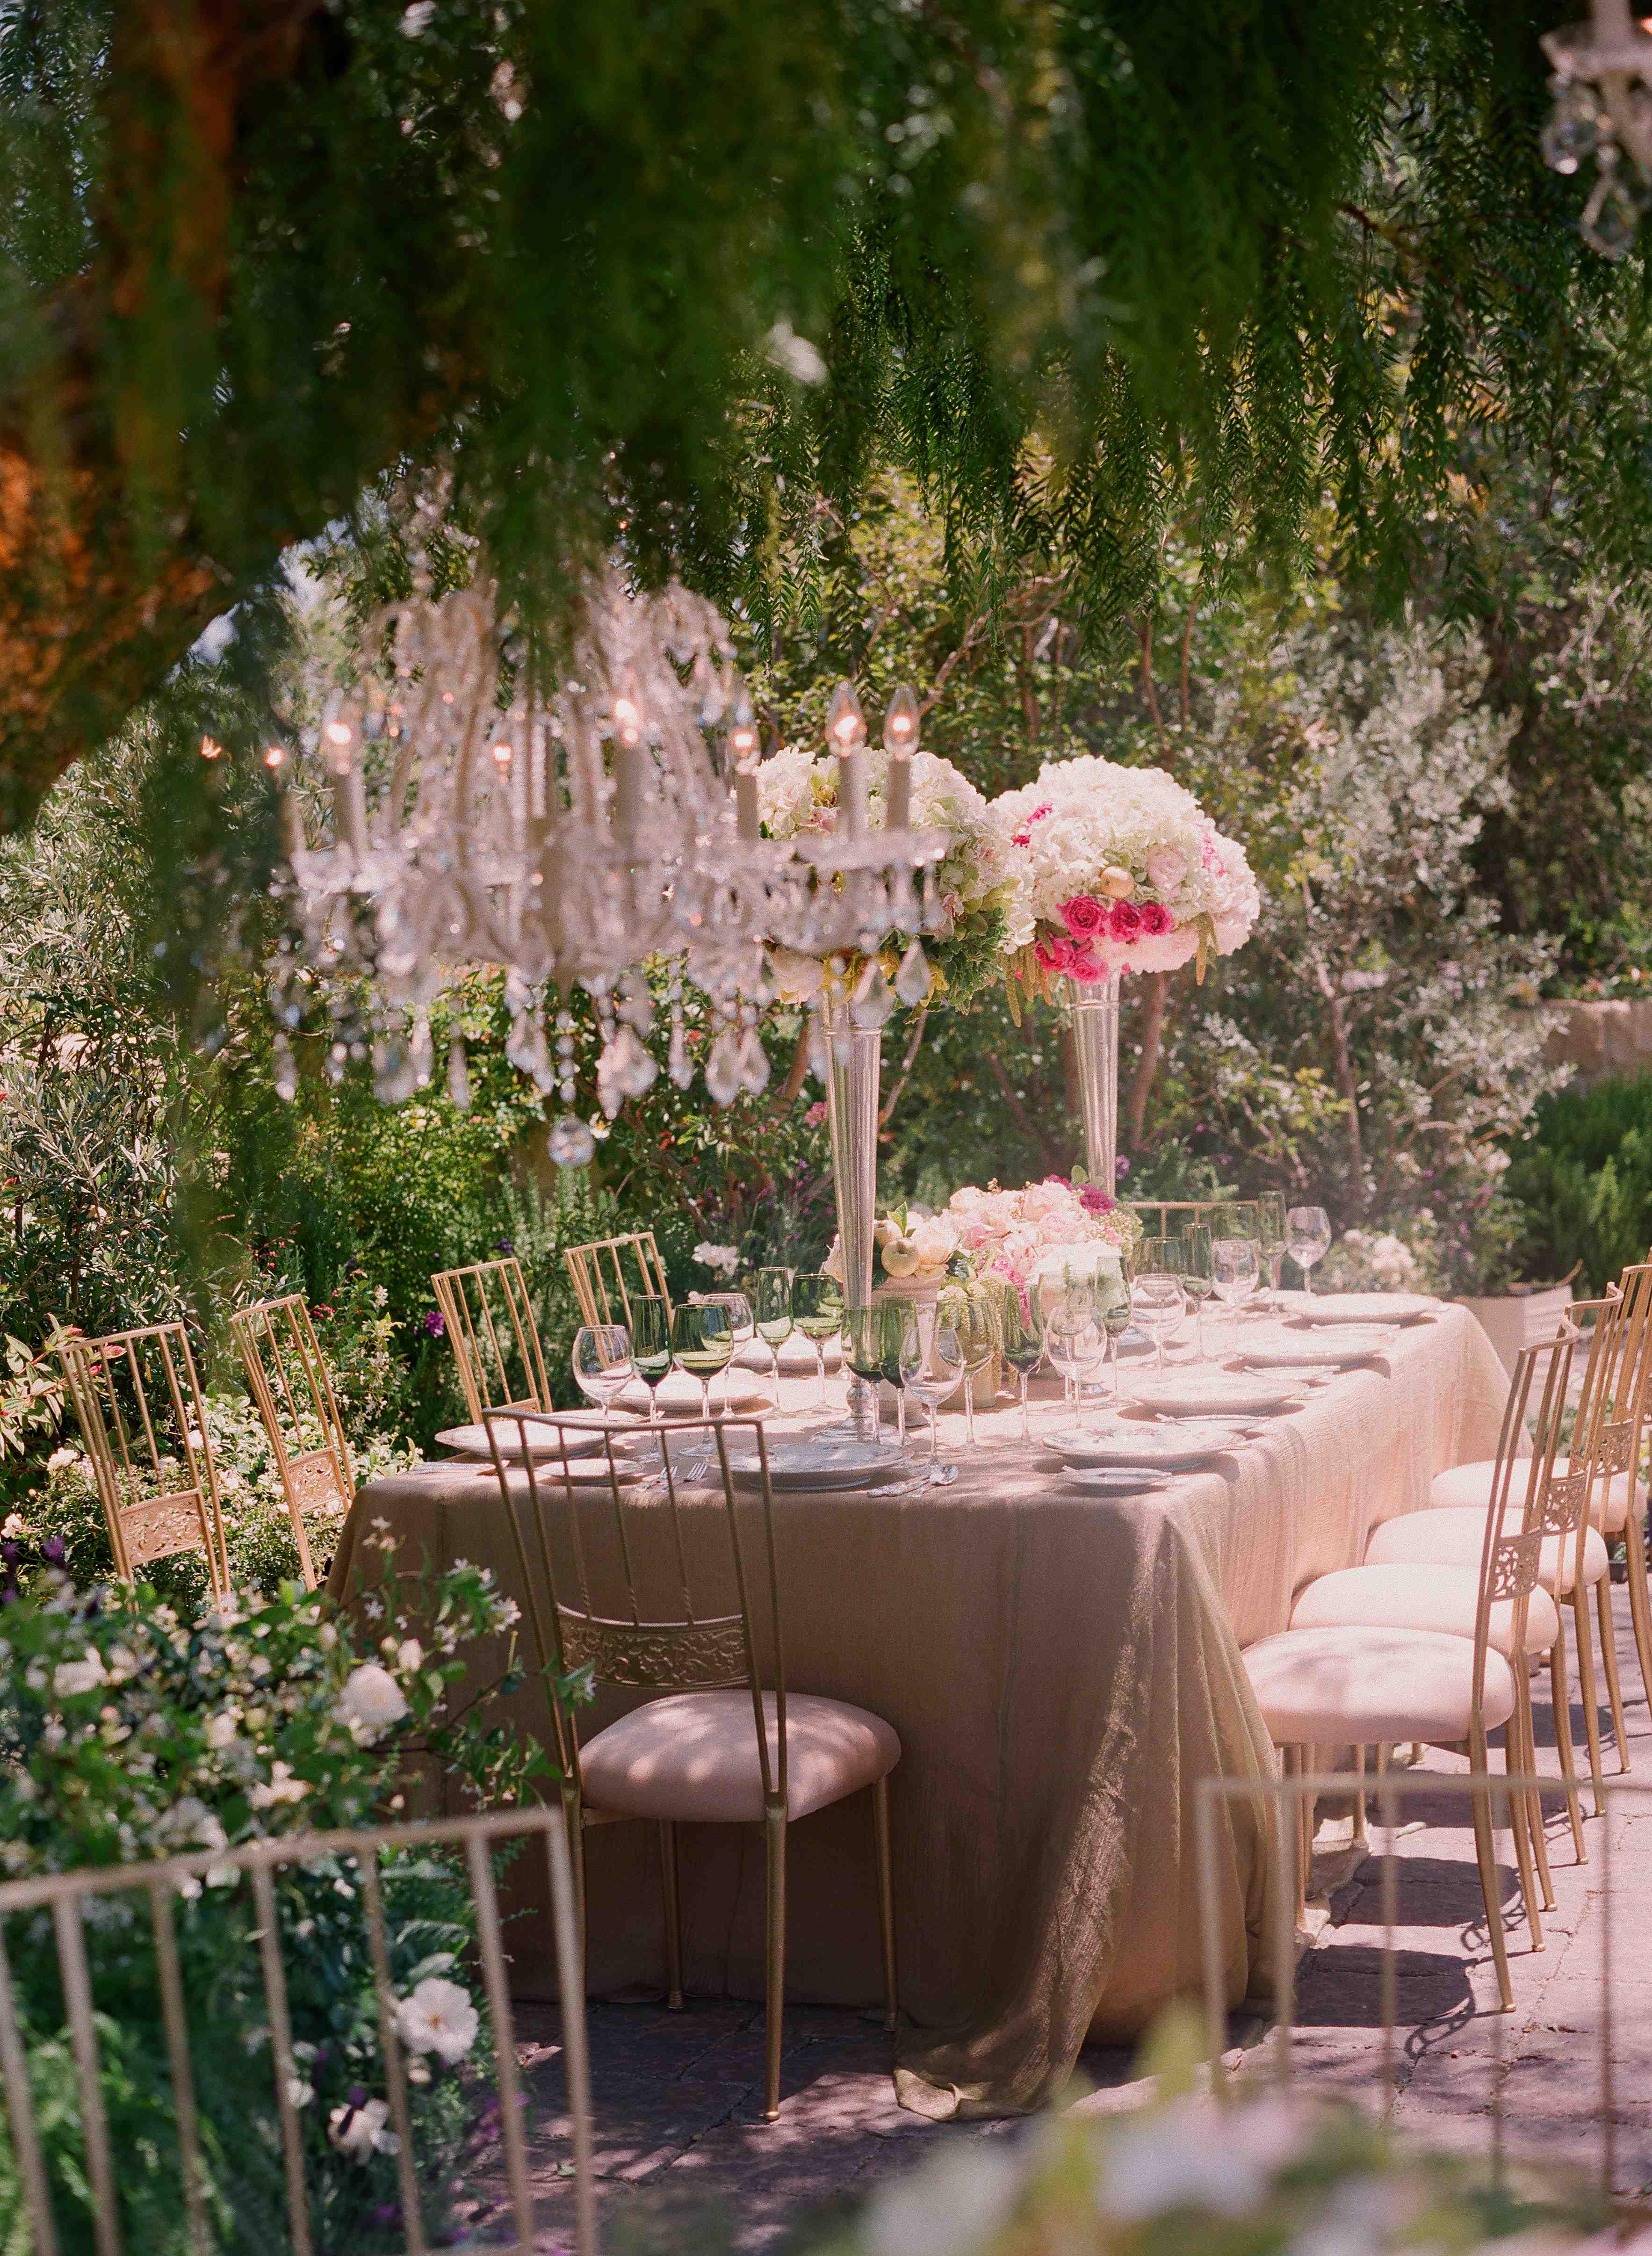 outdoor wedding reception garden romantic setting 2019 most popular real weddings